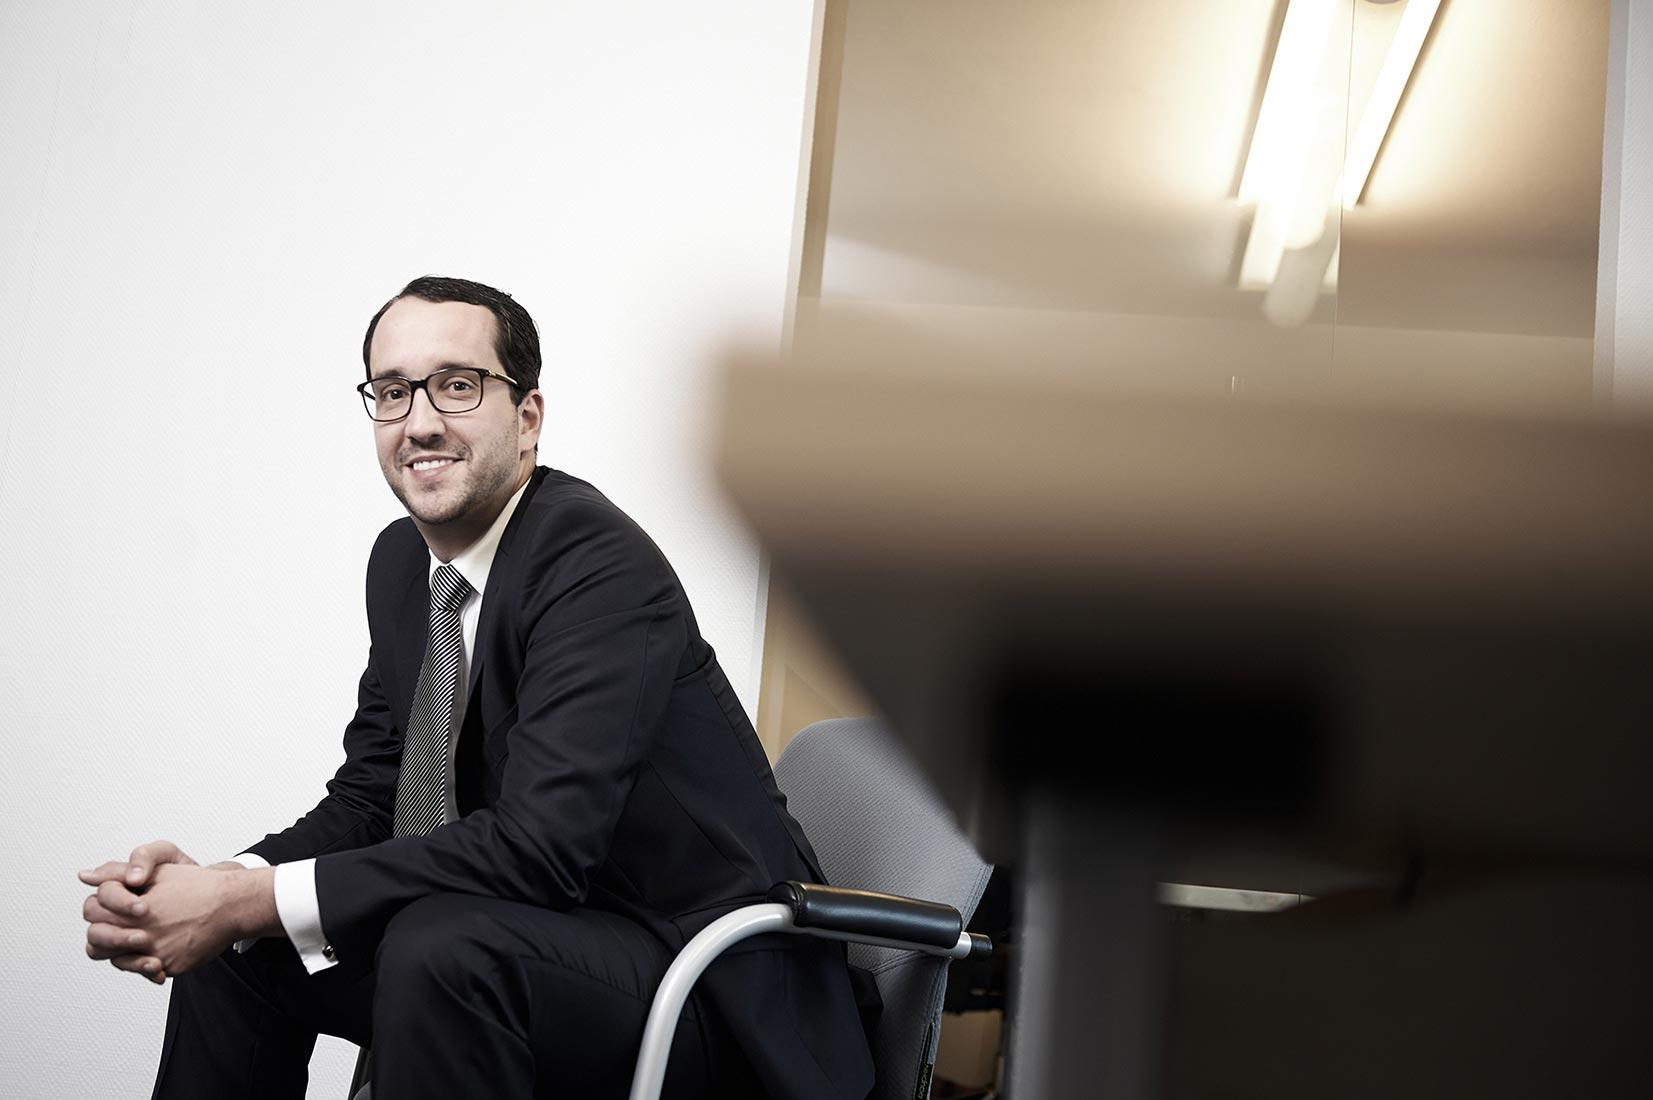 Corporate Portraitfotografie Steuerbüro SBS Schenkelberg, Herschbach/Selters